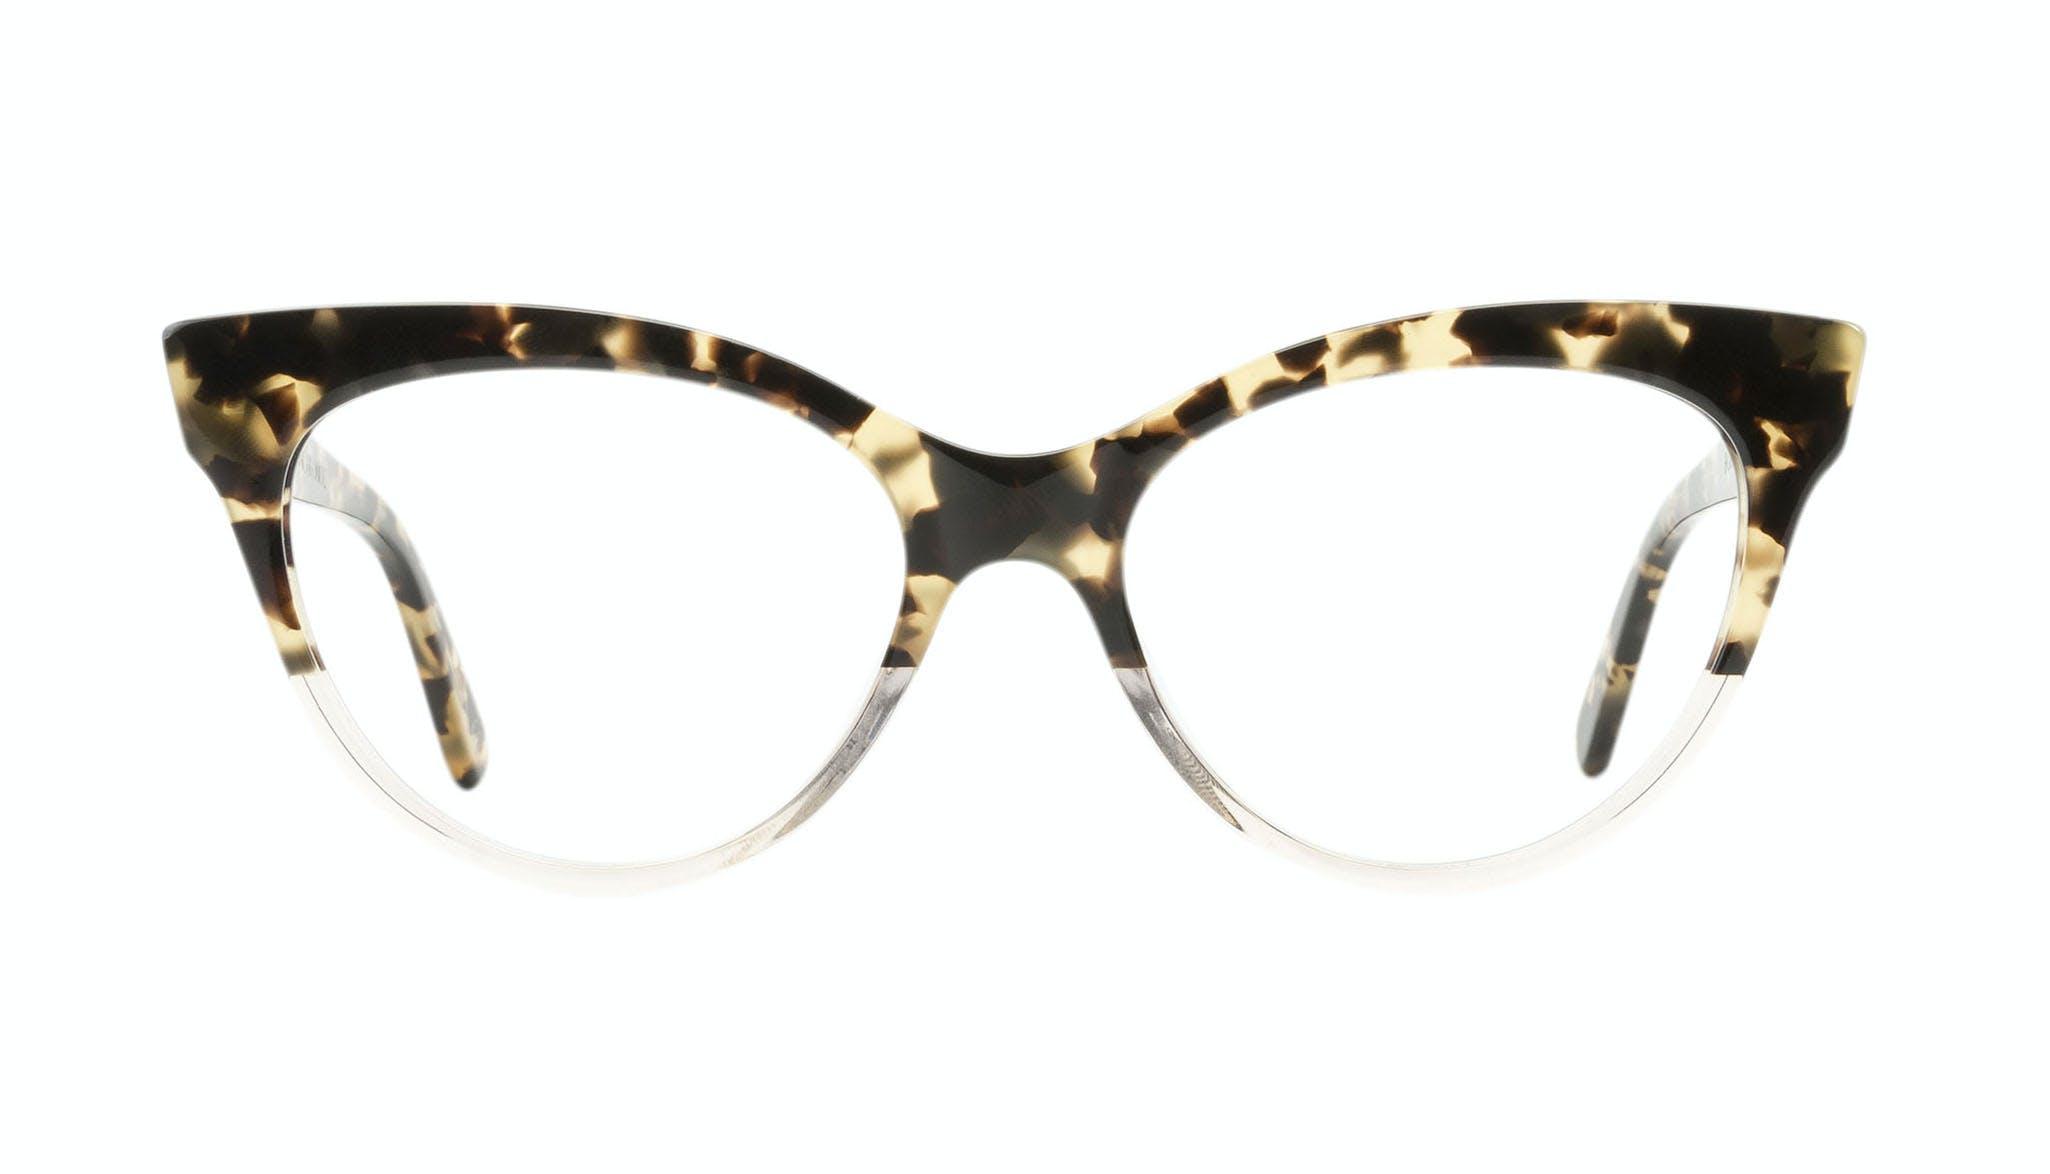 Affordable Fashion Glasses Cat Eye Daring Cateye Eyeglasses Women SkunkBoy Champagne Tort Front